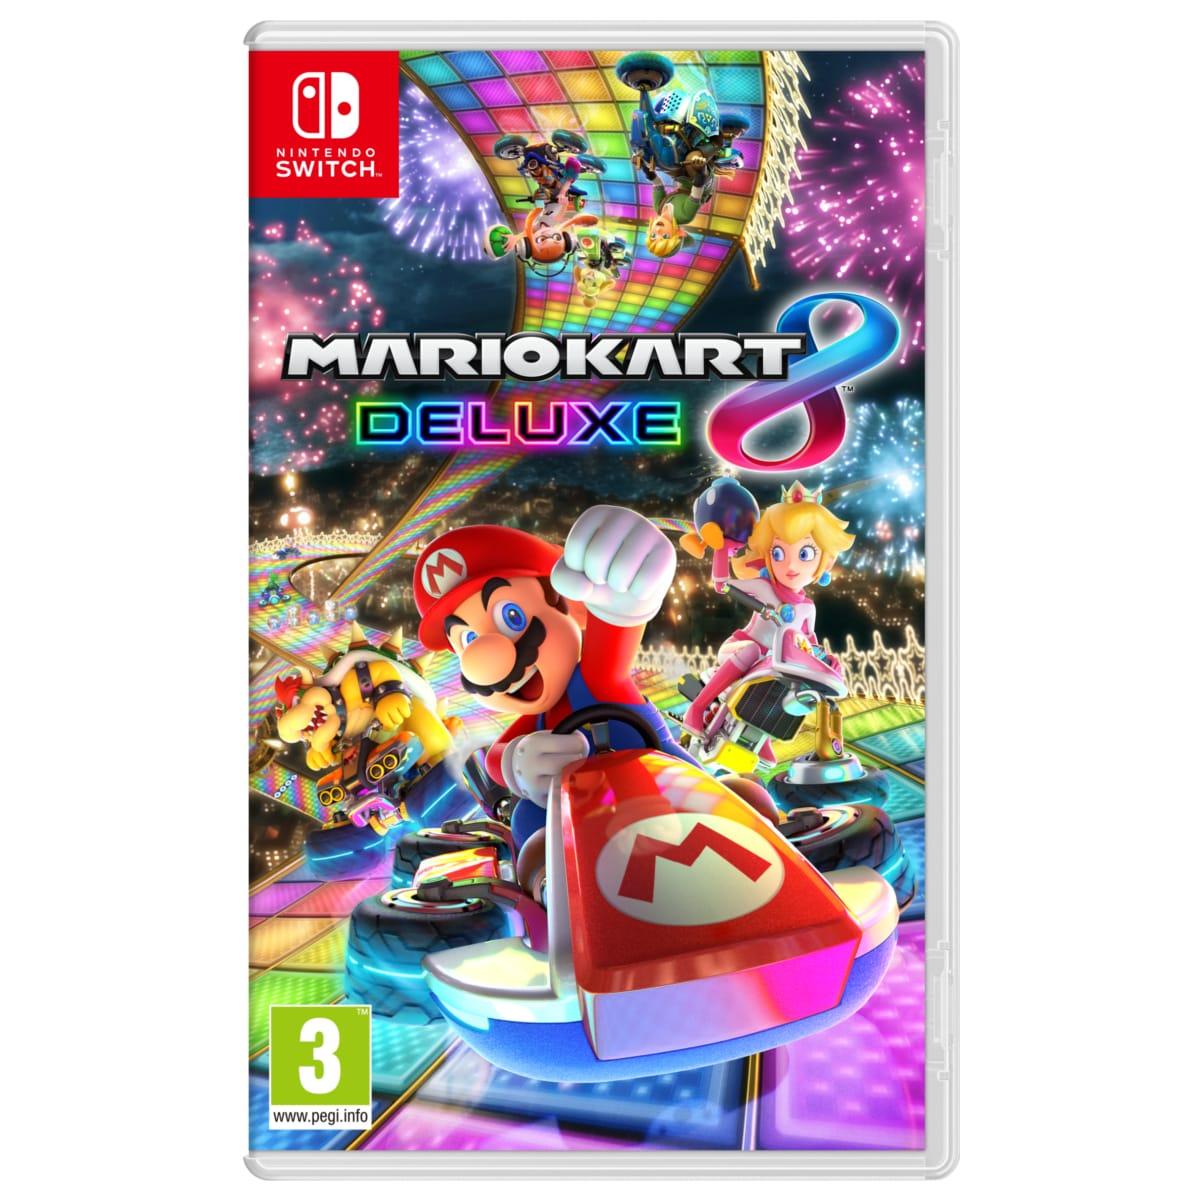 Code promo Cdiscount : Jeu Mario Kart 8 Deluxe sur Nintendo Switch à 39,99€